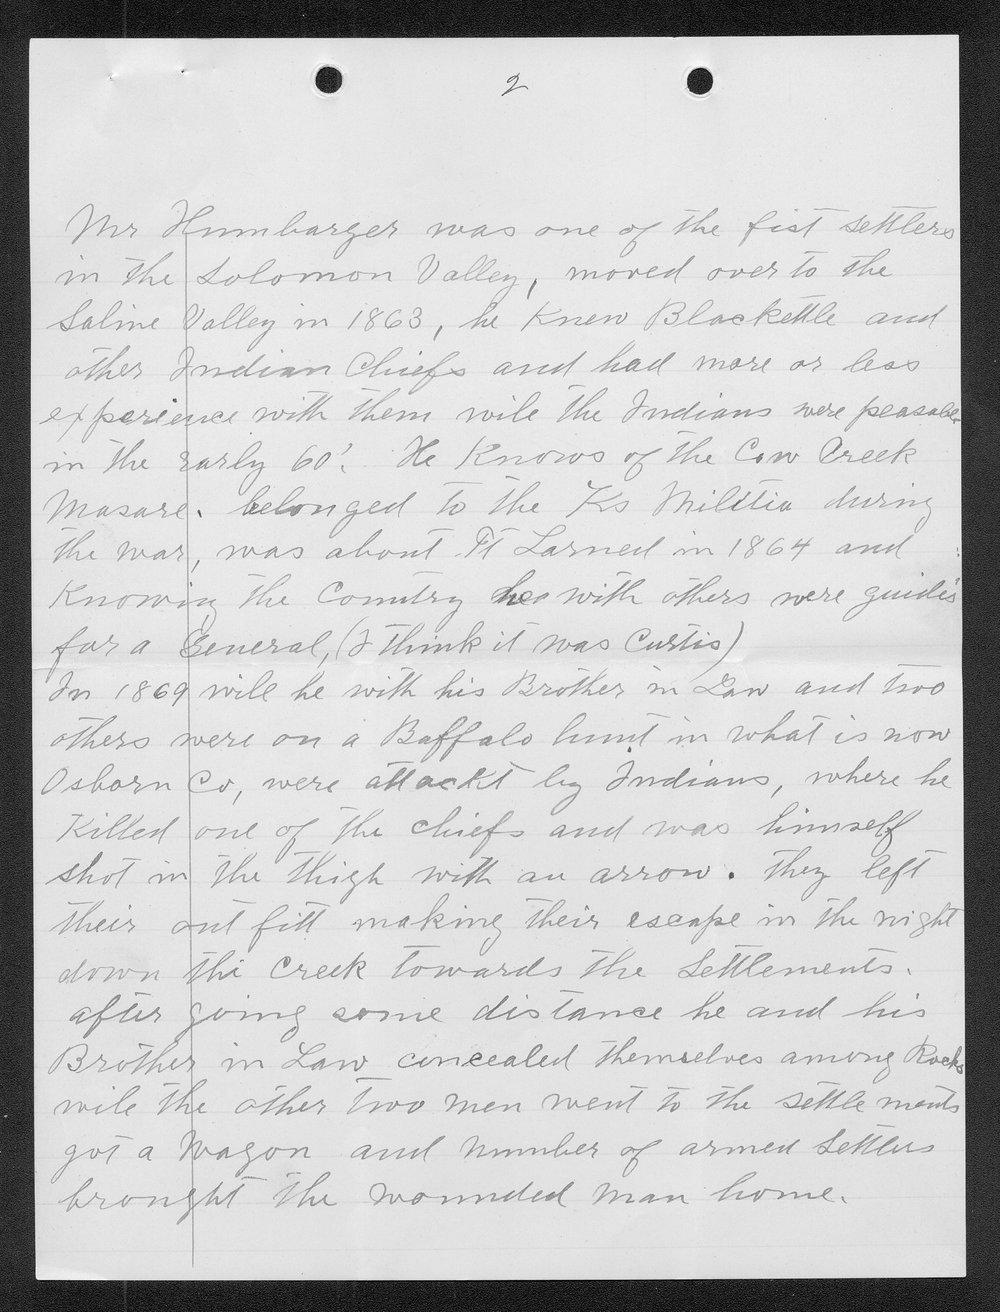 Adolph Roenigk and George W. Martin correspondence - 9